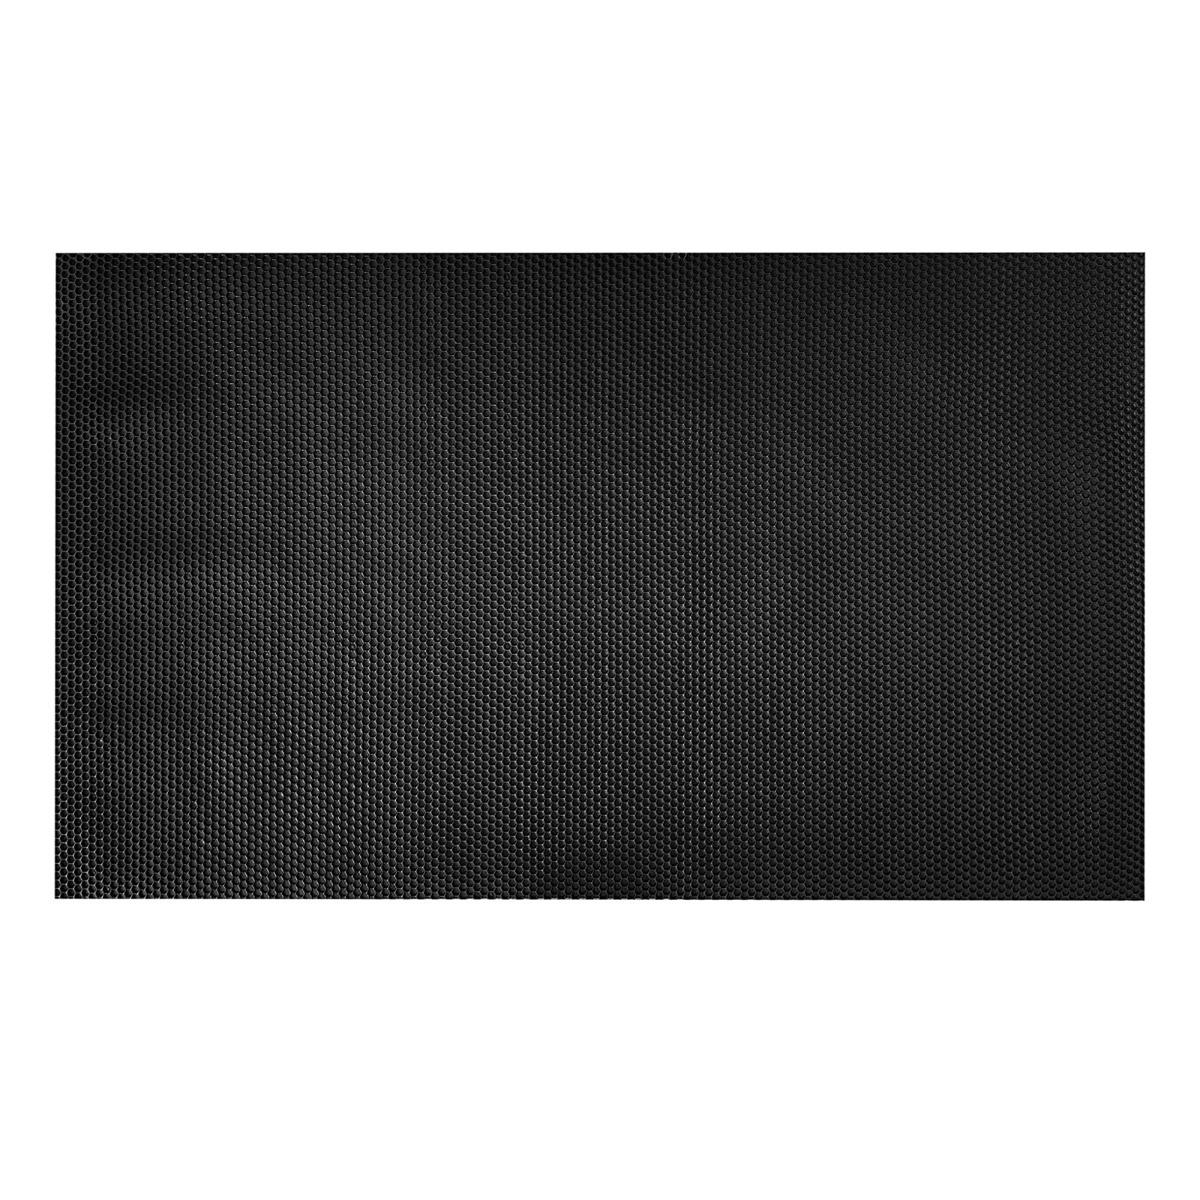 BBQ Large HEX Floor Mat in Black